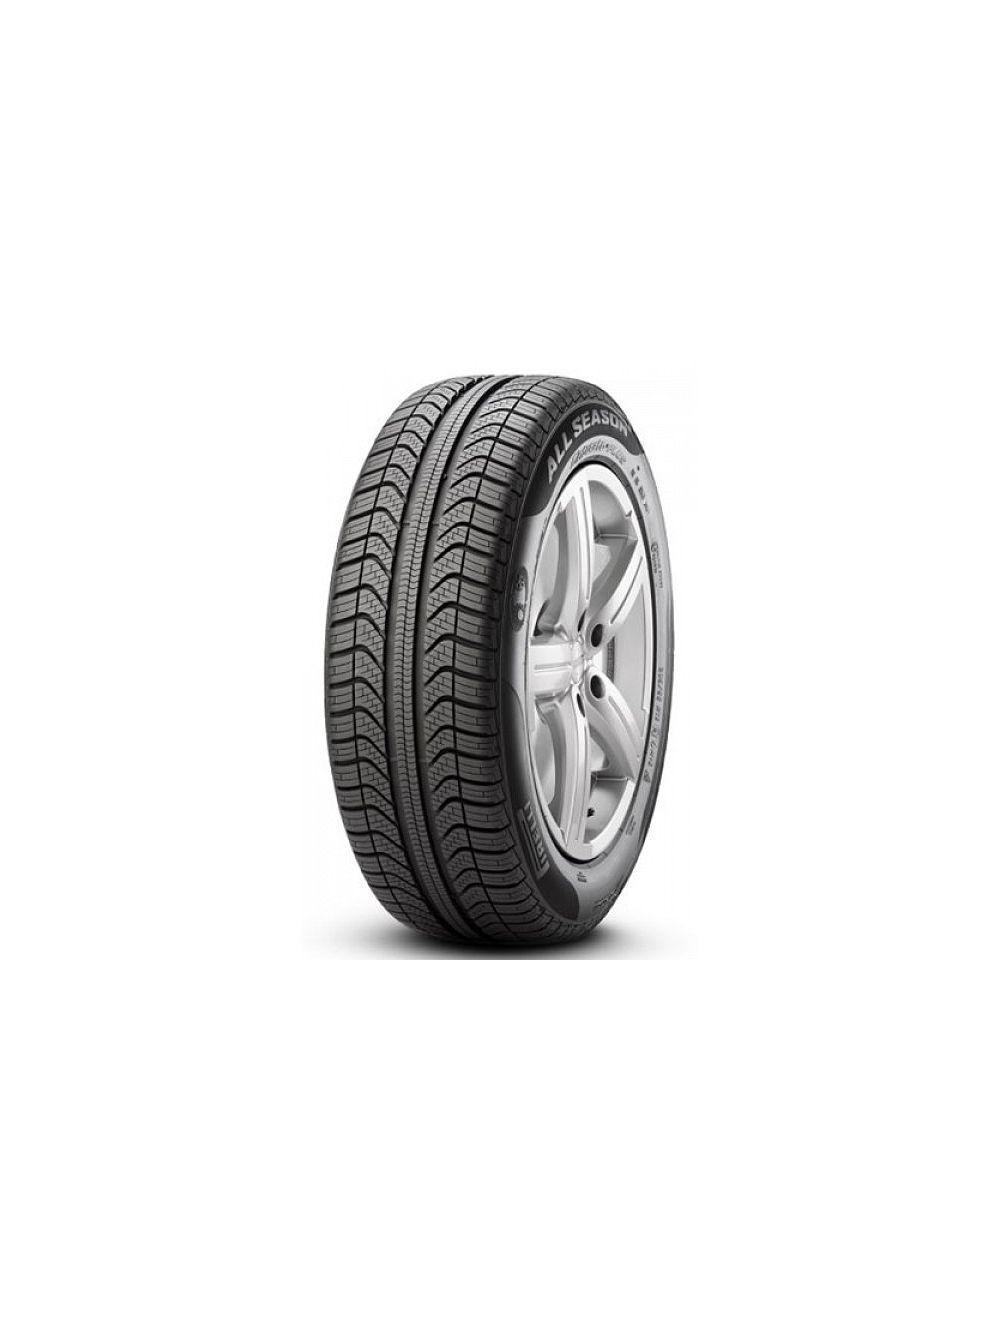 Pirelli 185/55R15 H Cinturato All Season Plus Négyévszakos gumi